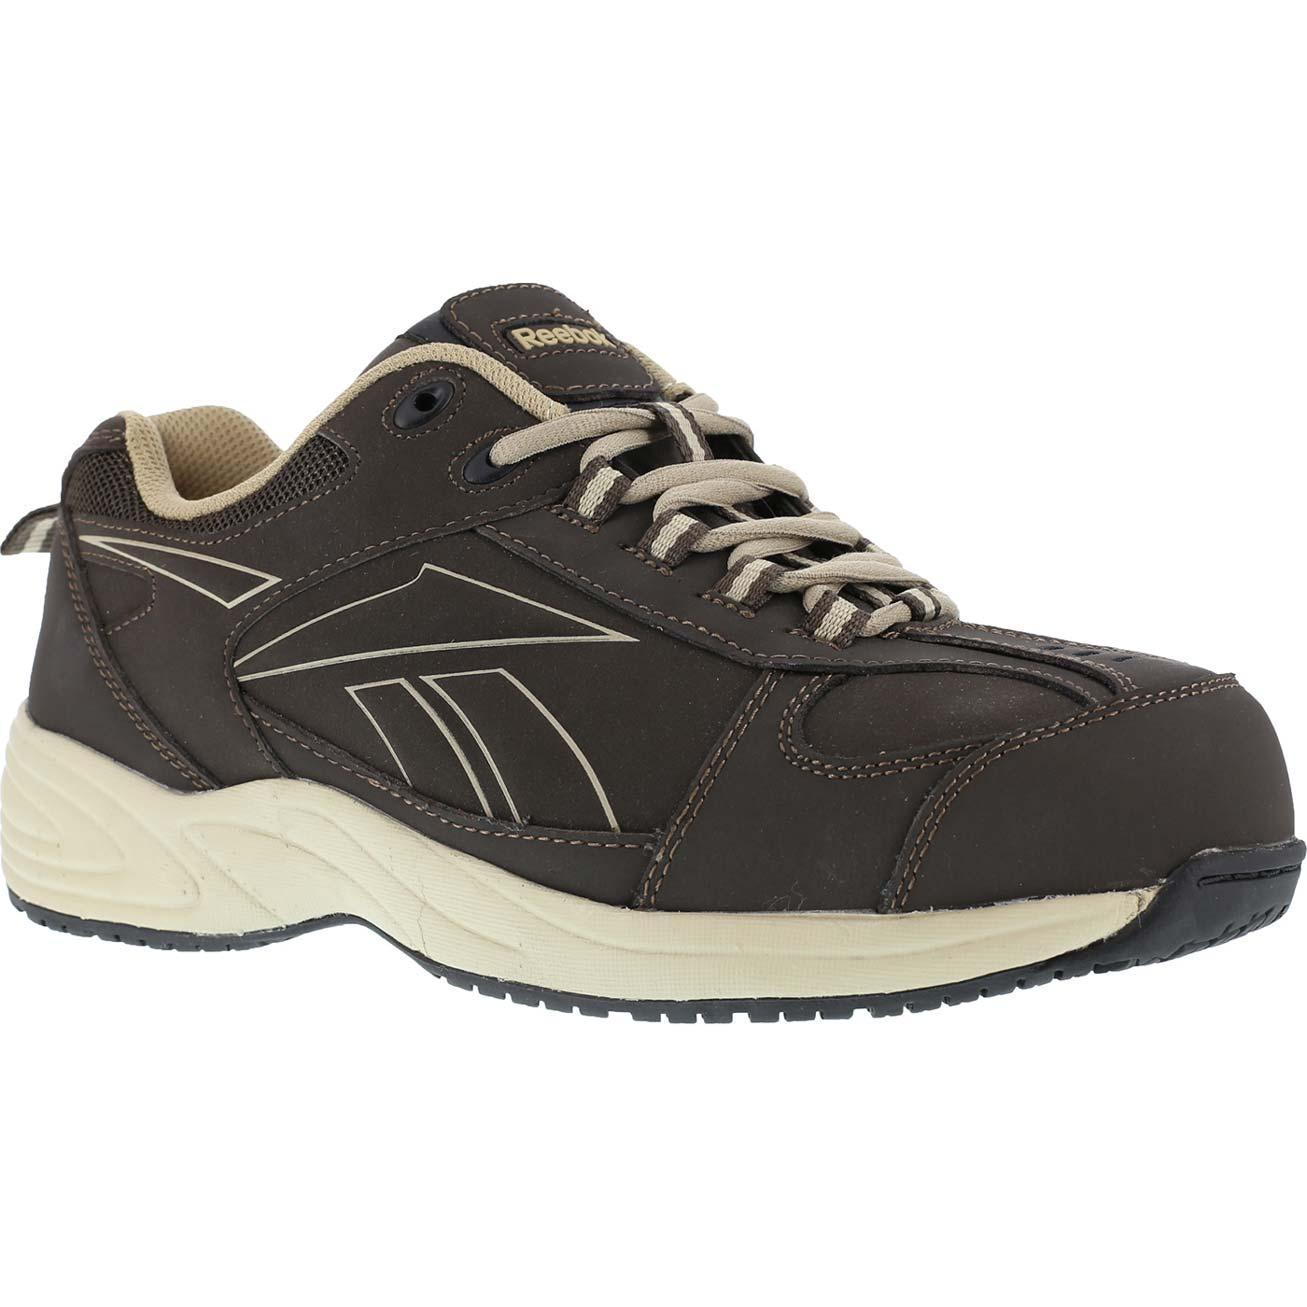 Reebok Composite Toe LoCut Athletic Shoe #RB1870